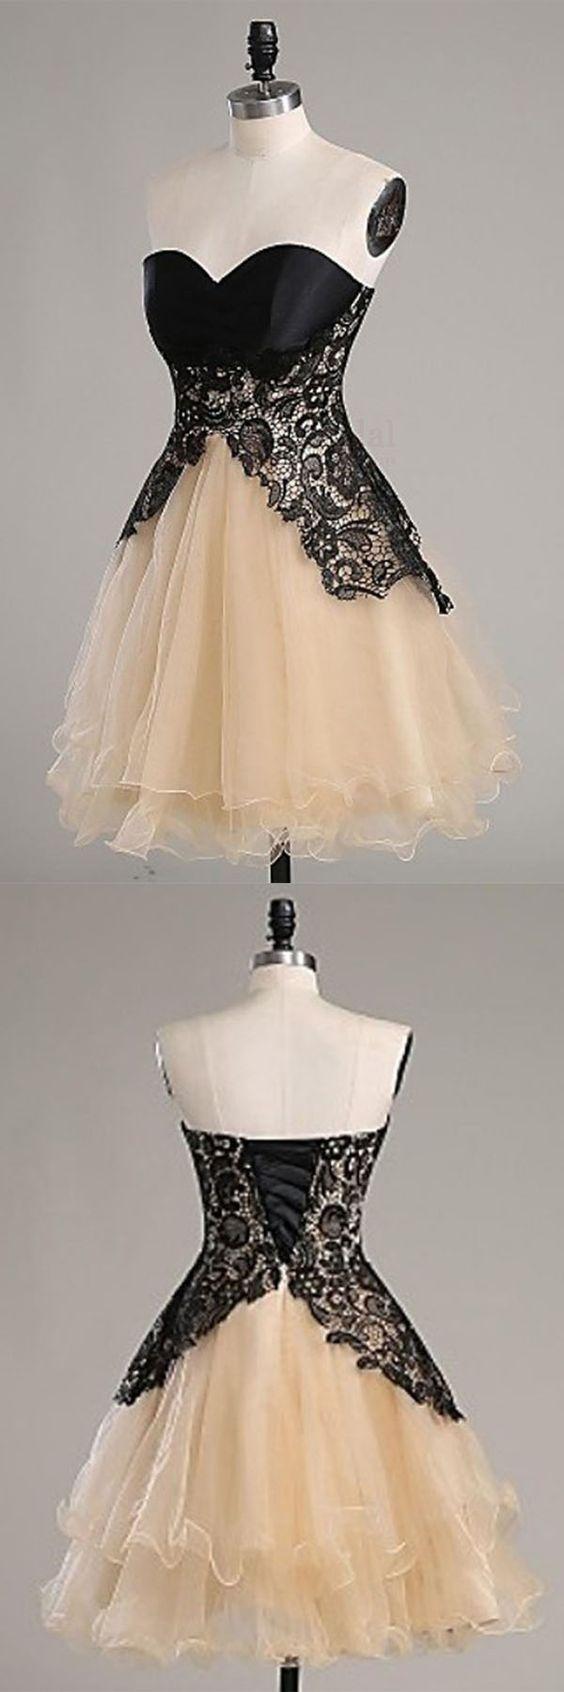 Black lace prom dress,sweatheart neck prom dress,homecoming dress,short prom…